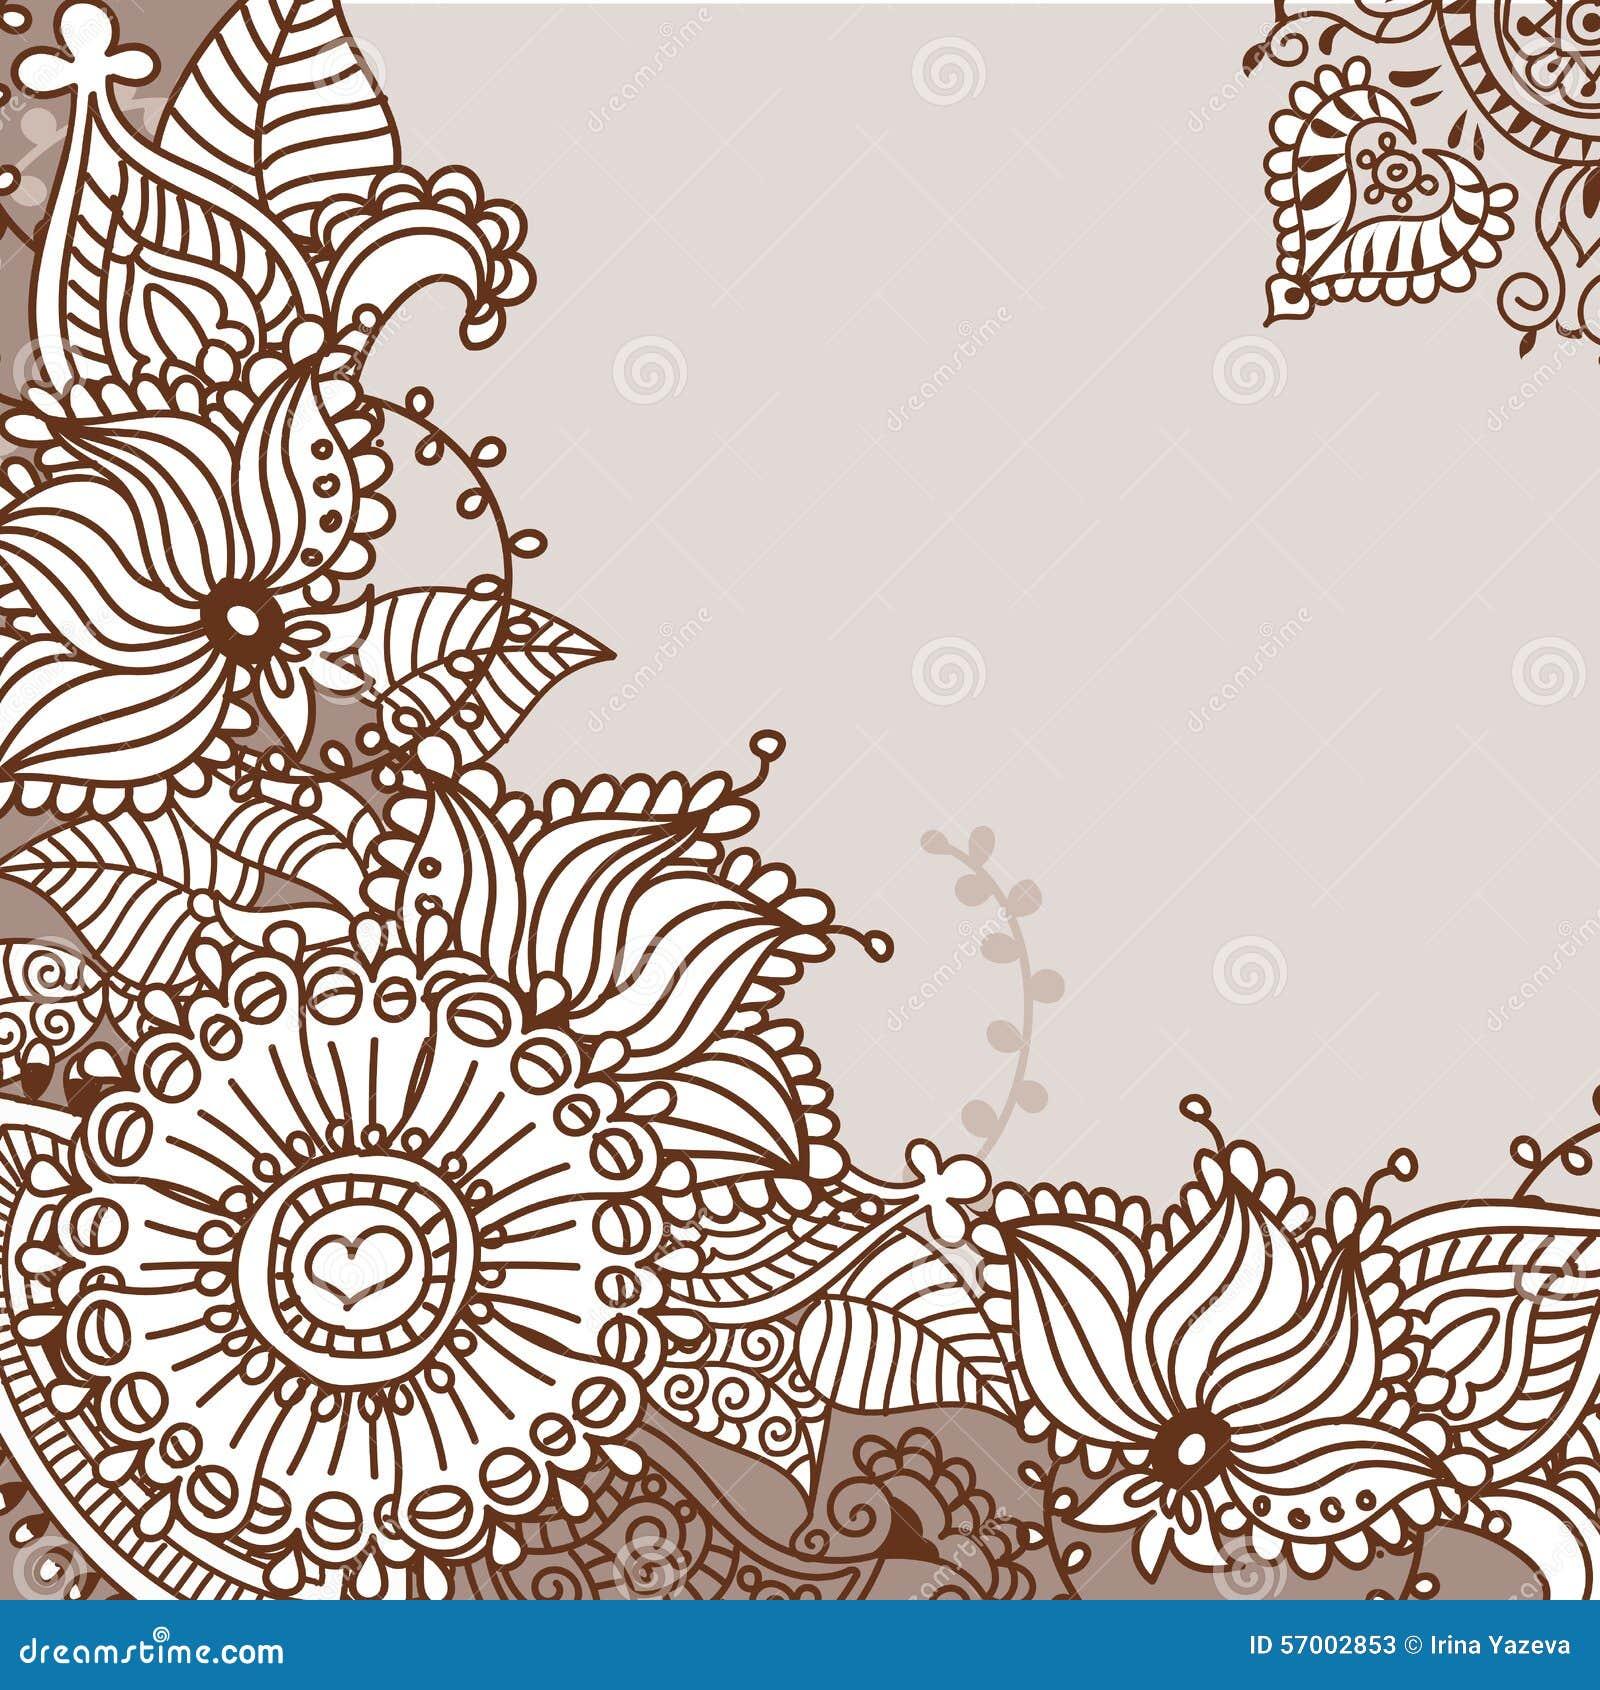 Henna Tattoo Doodle Elements Vector Set Stock Vector Illustration